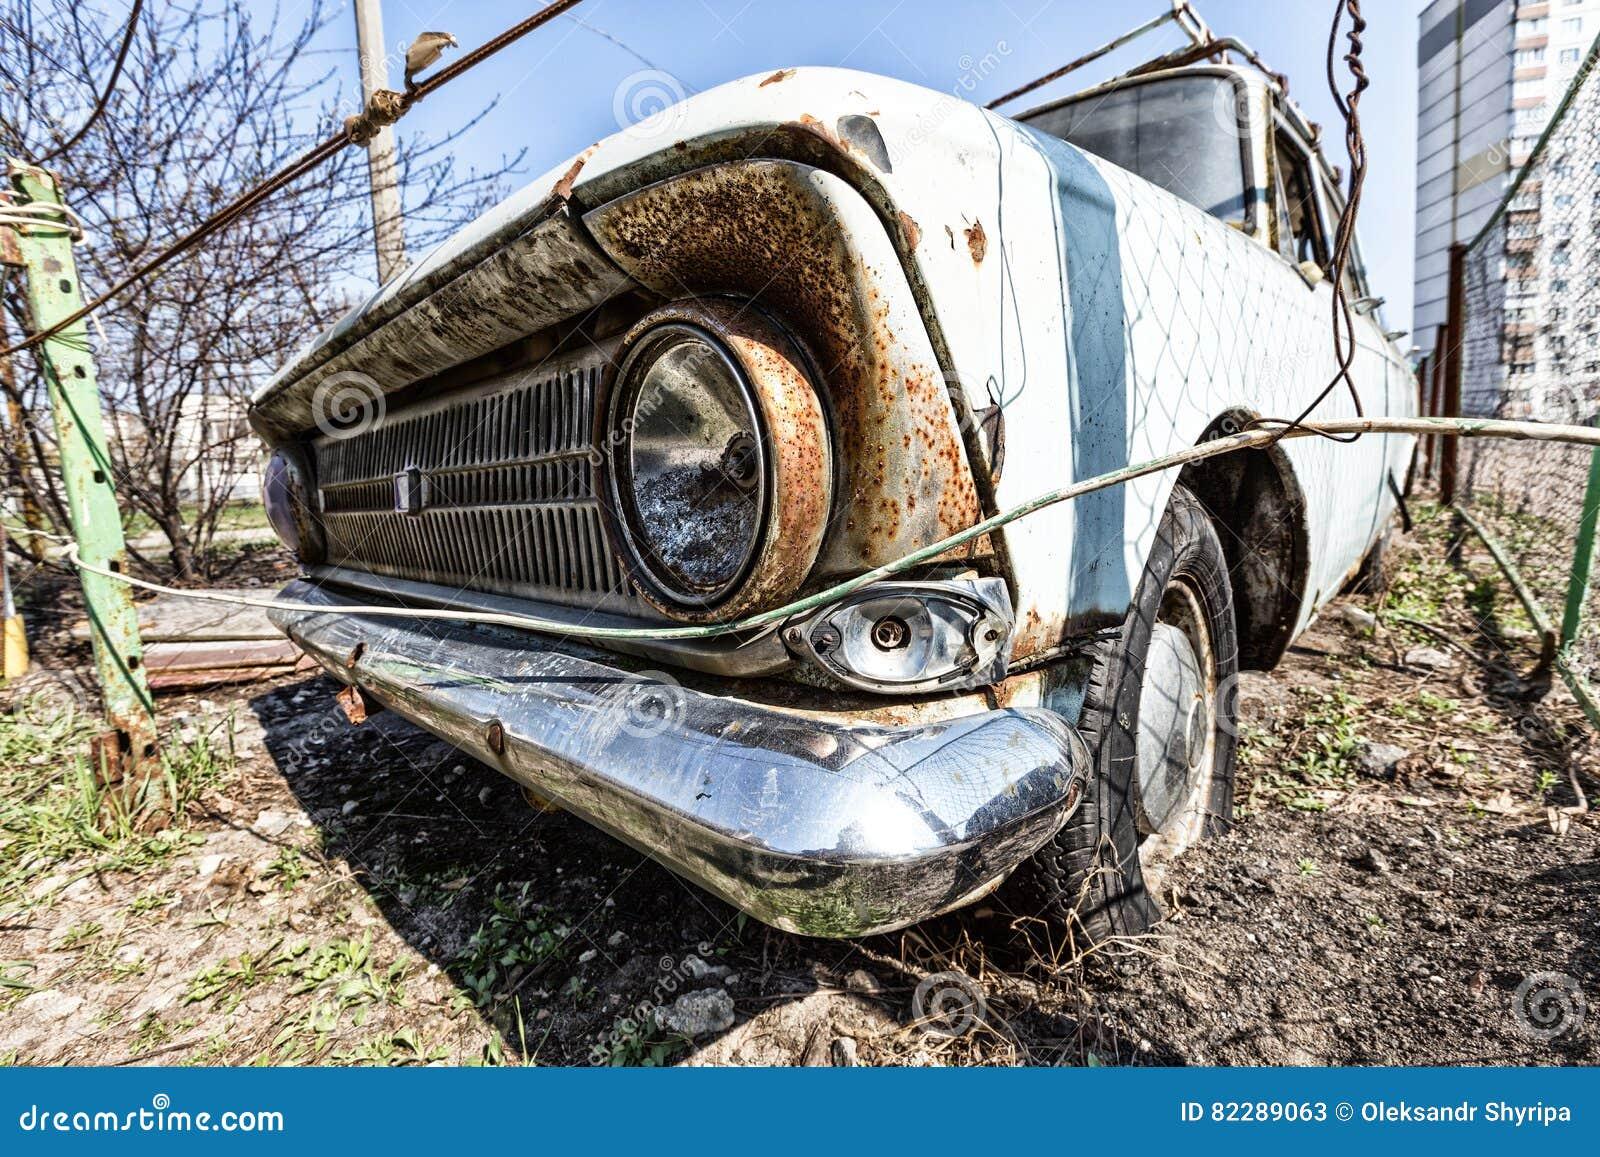 Ржавый ретро автомобиль